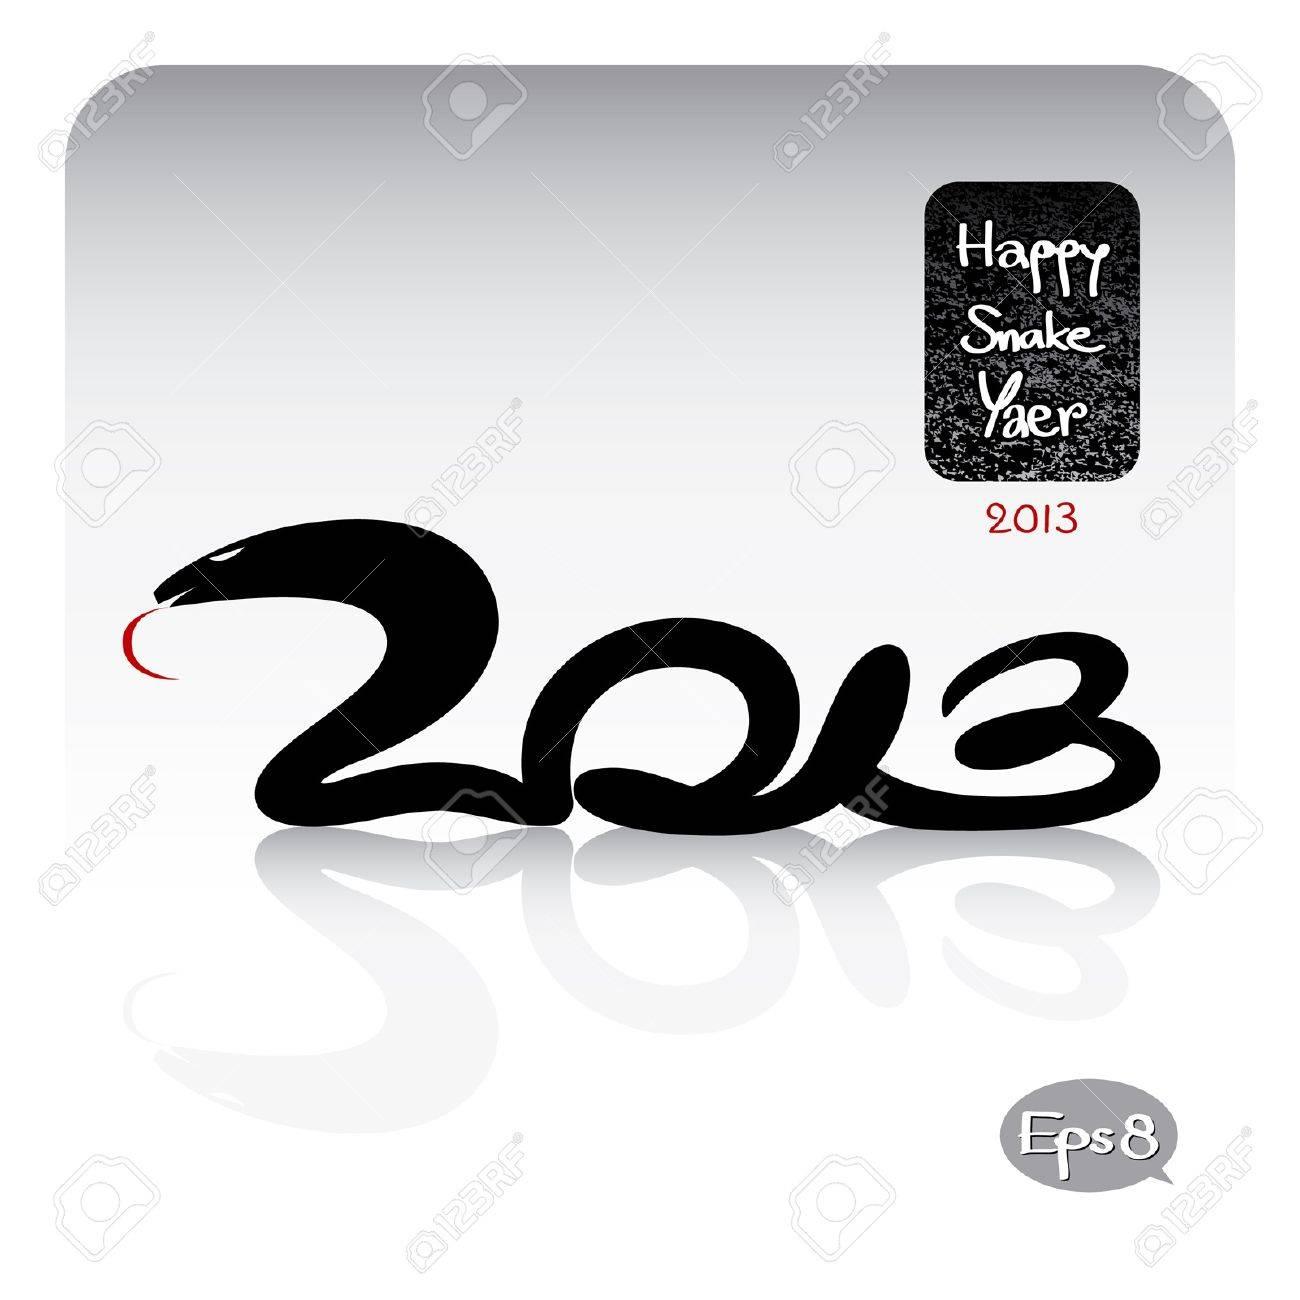 happy snake year 2013 - 15528487